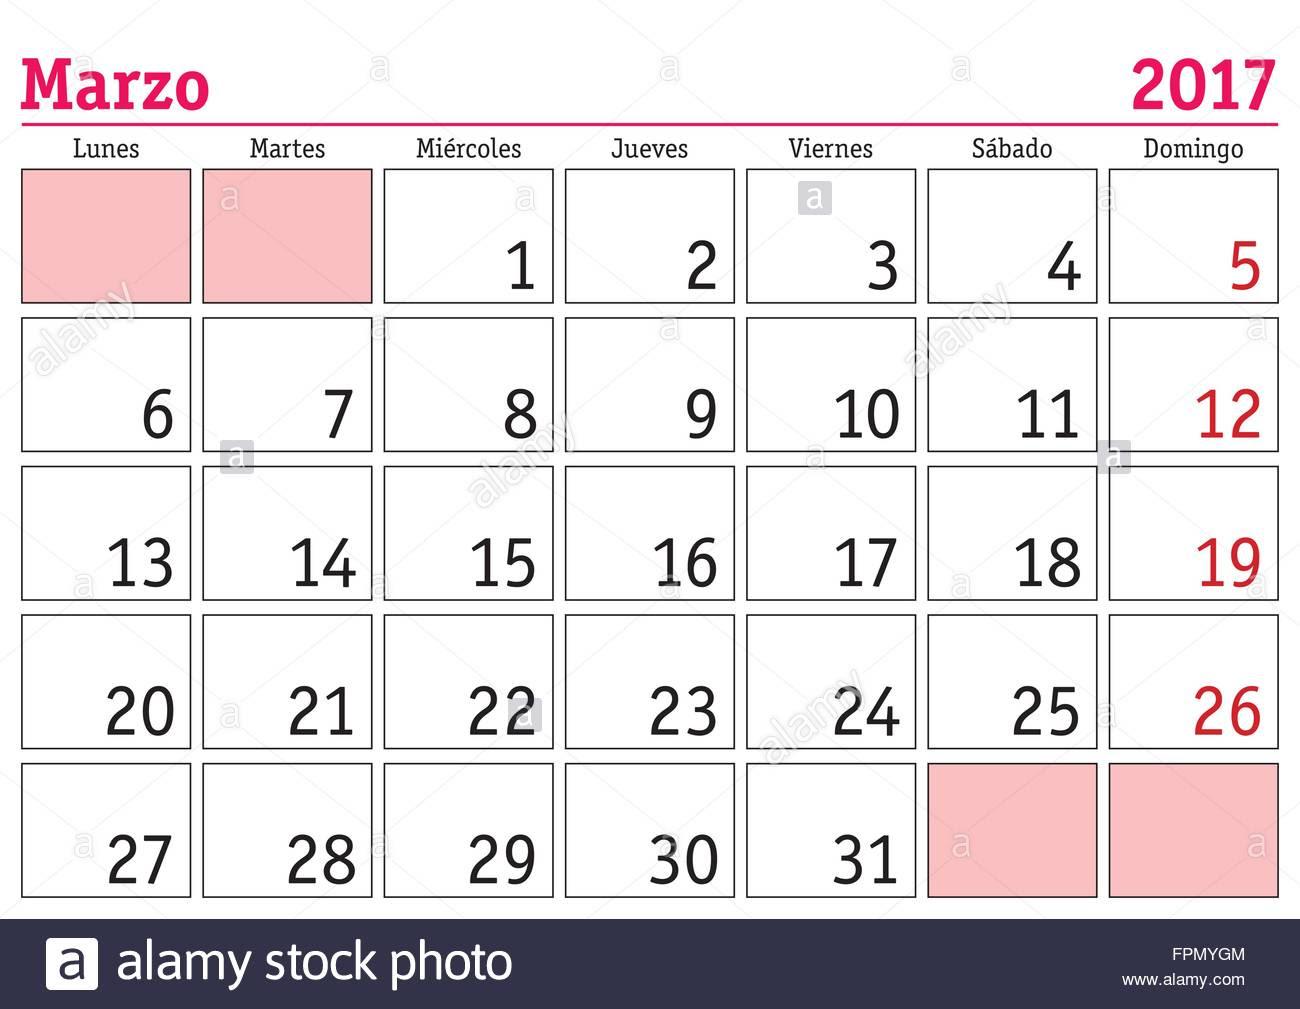 March Calendar 2017 In Spanish – 2017 March Calendar